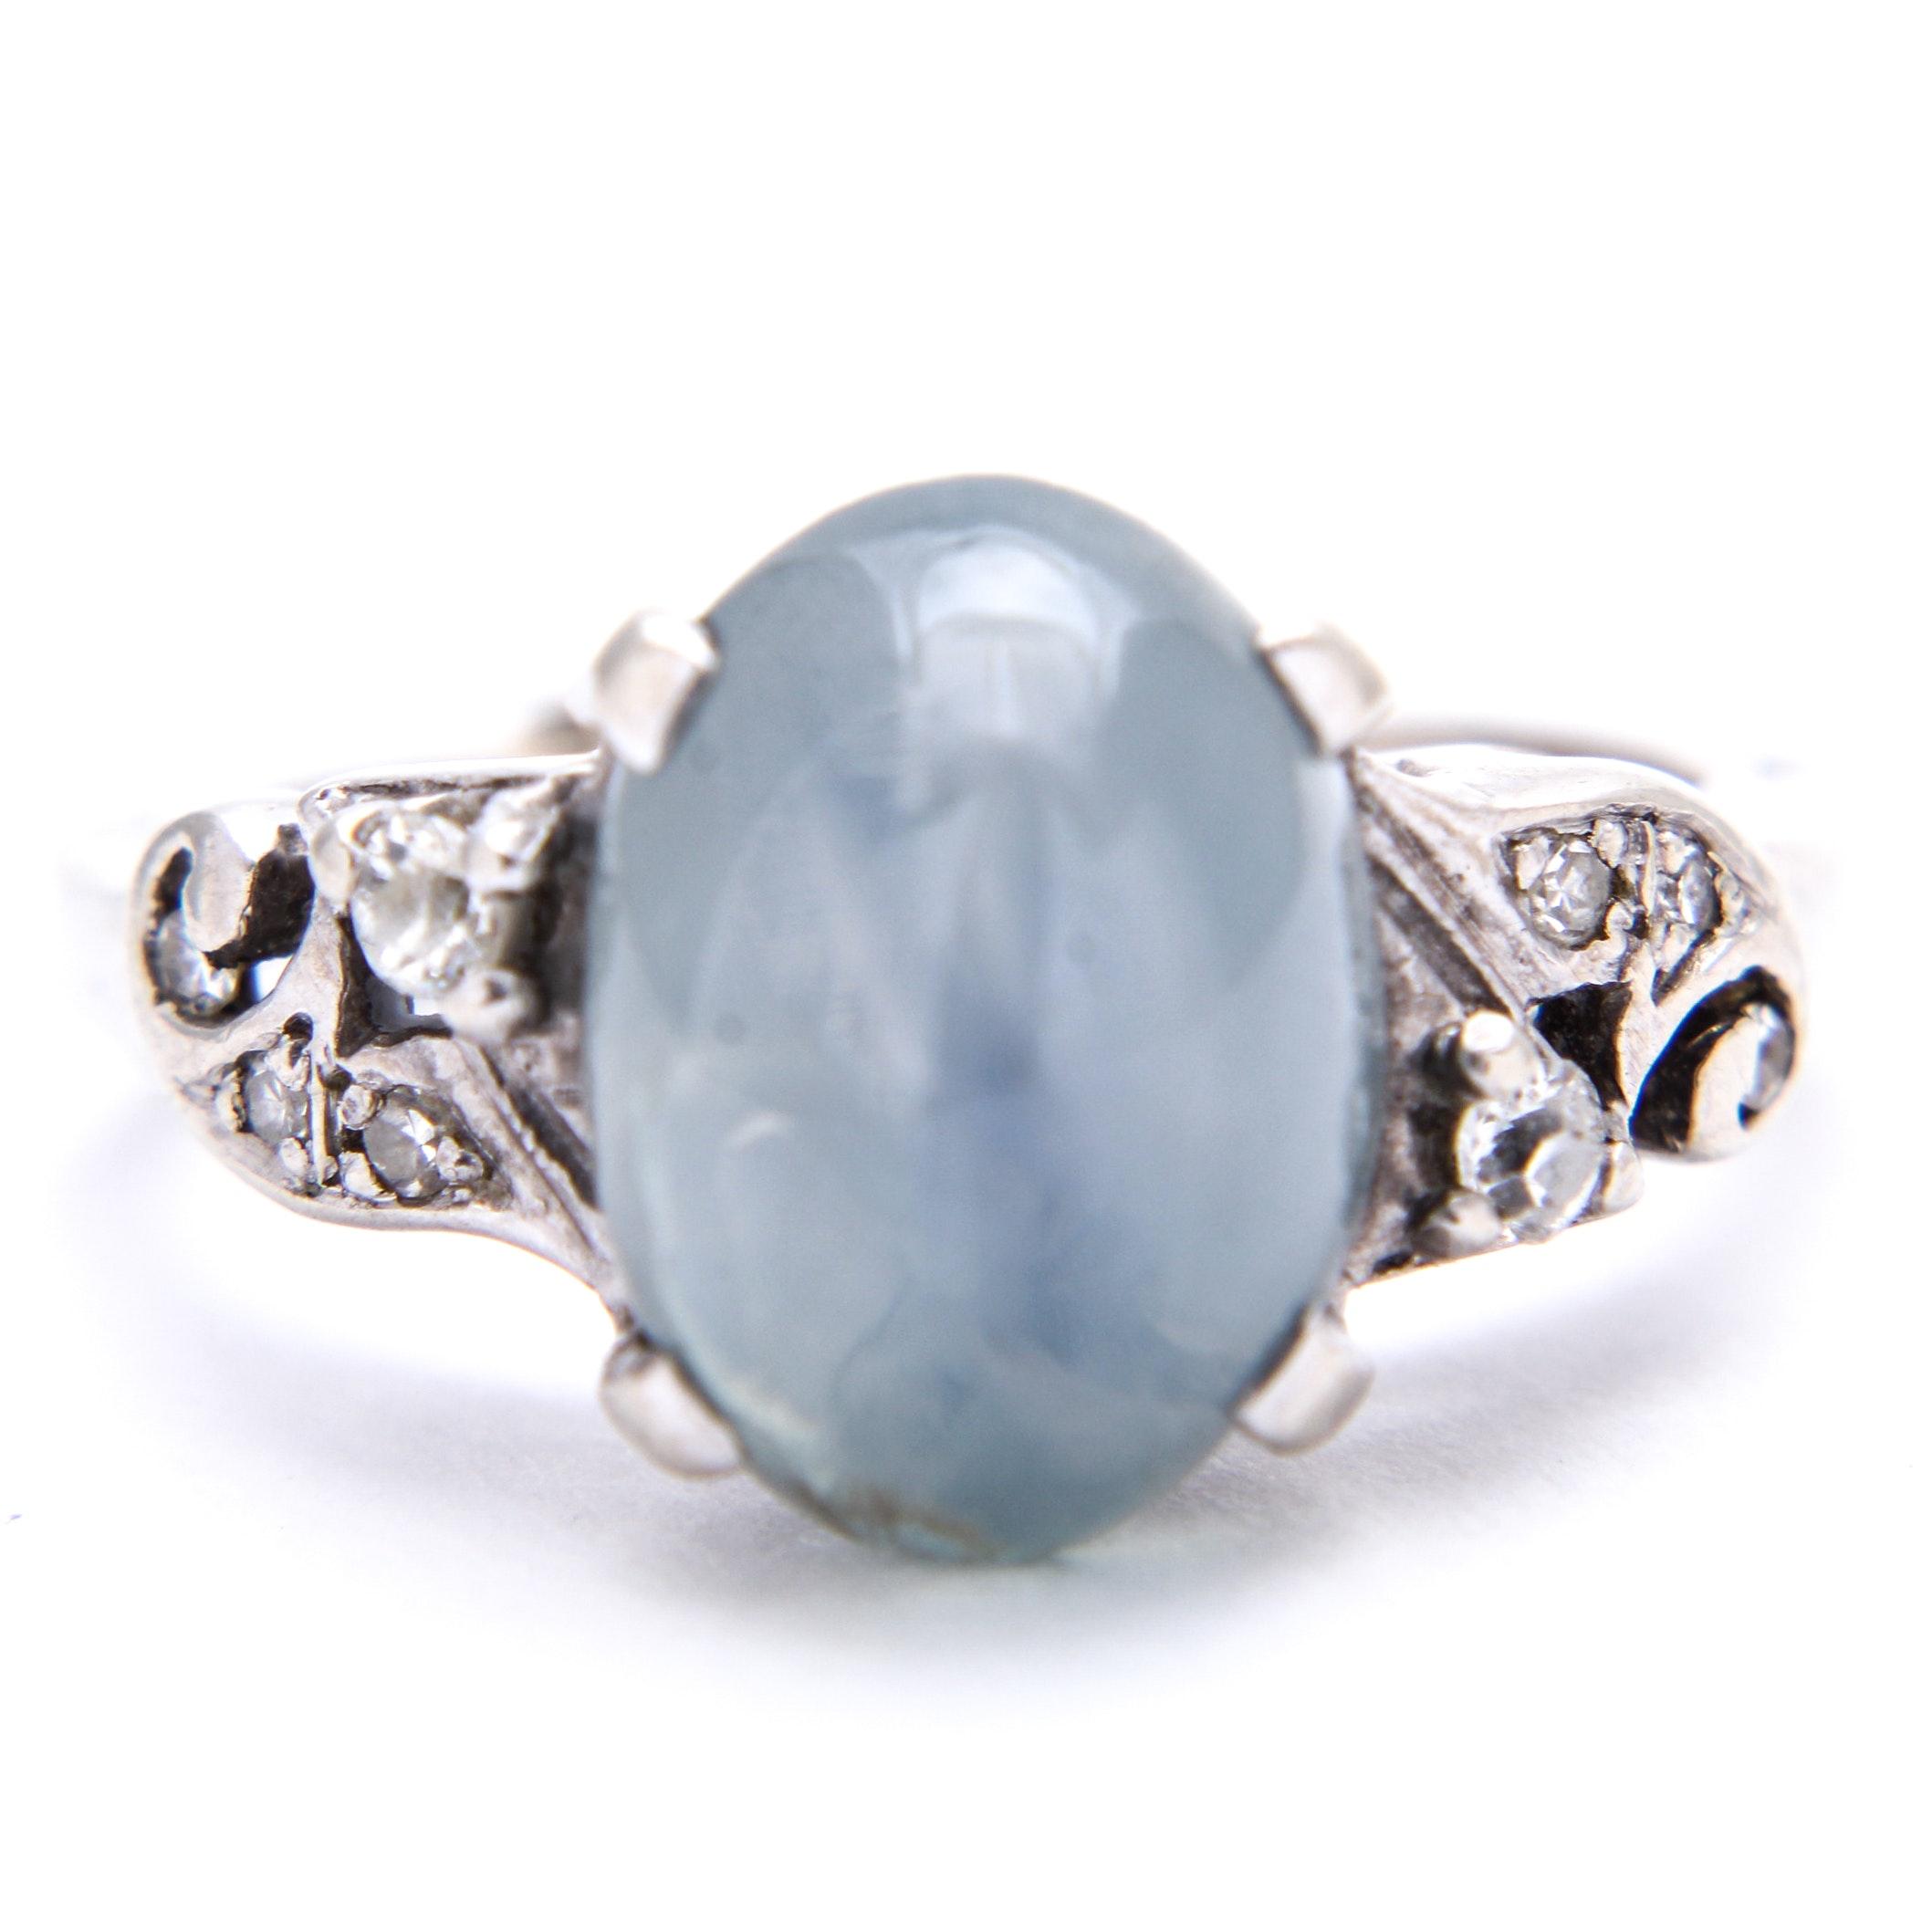 14K White Gold, Star Sapphire and Diamond Ring